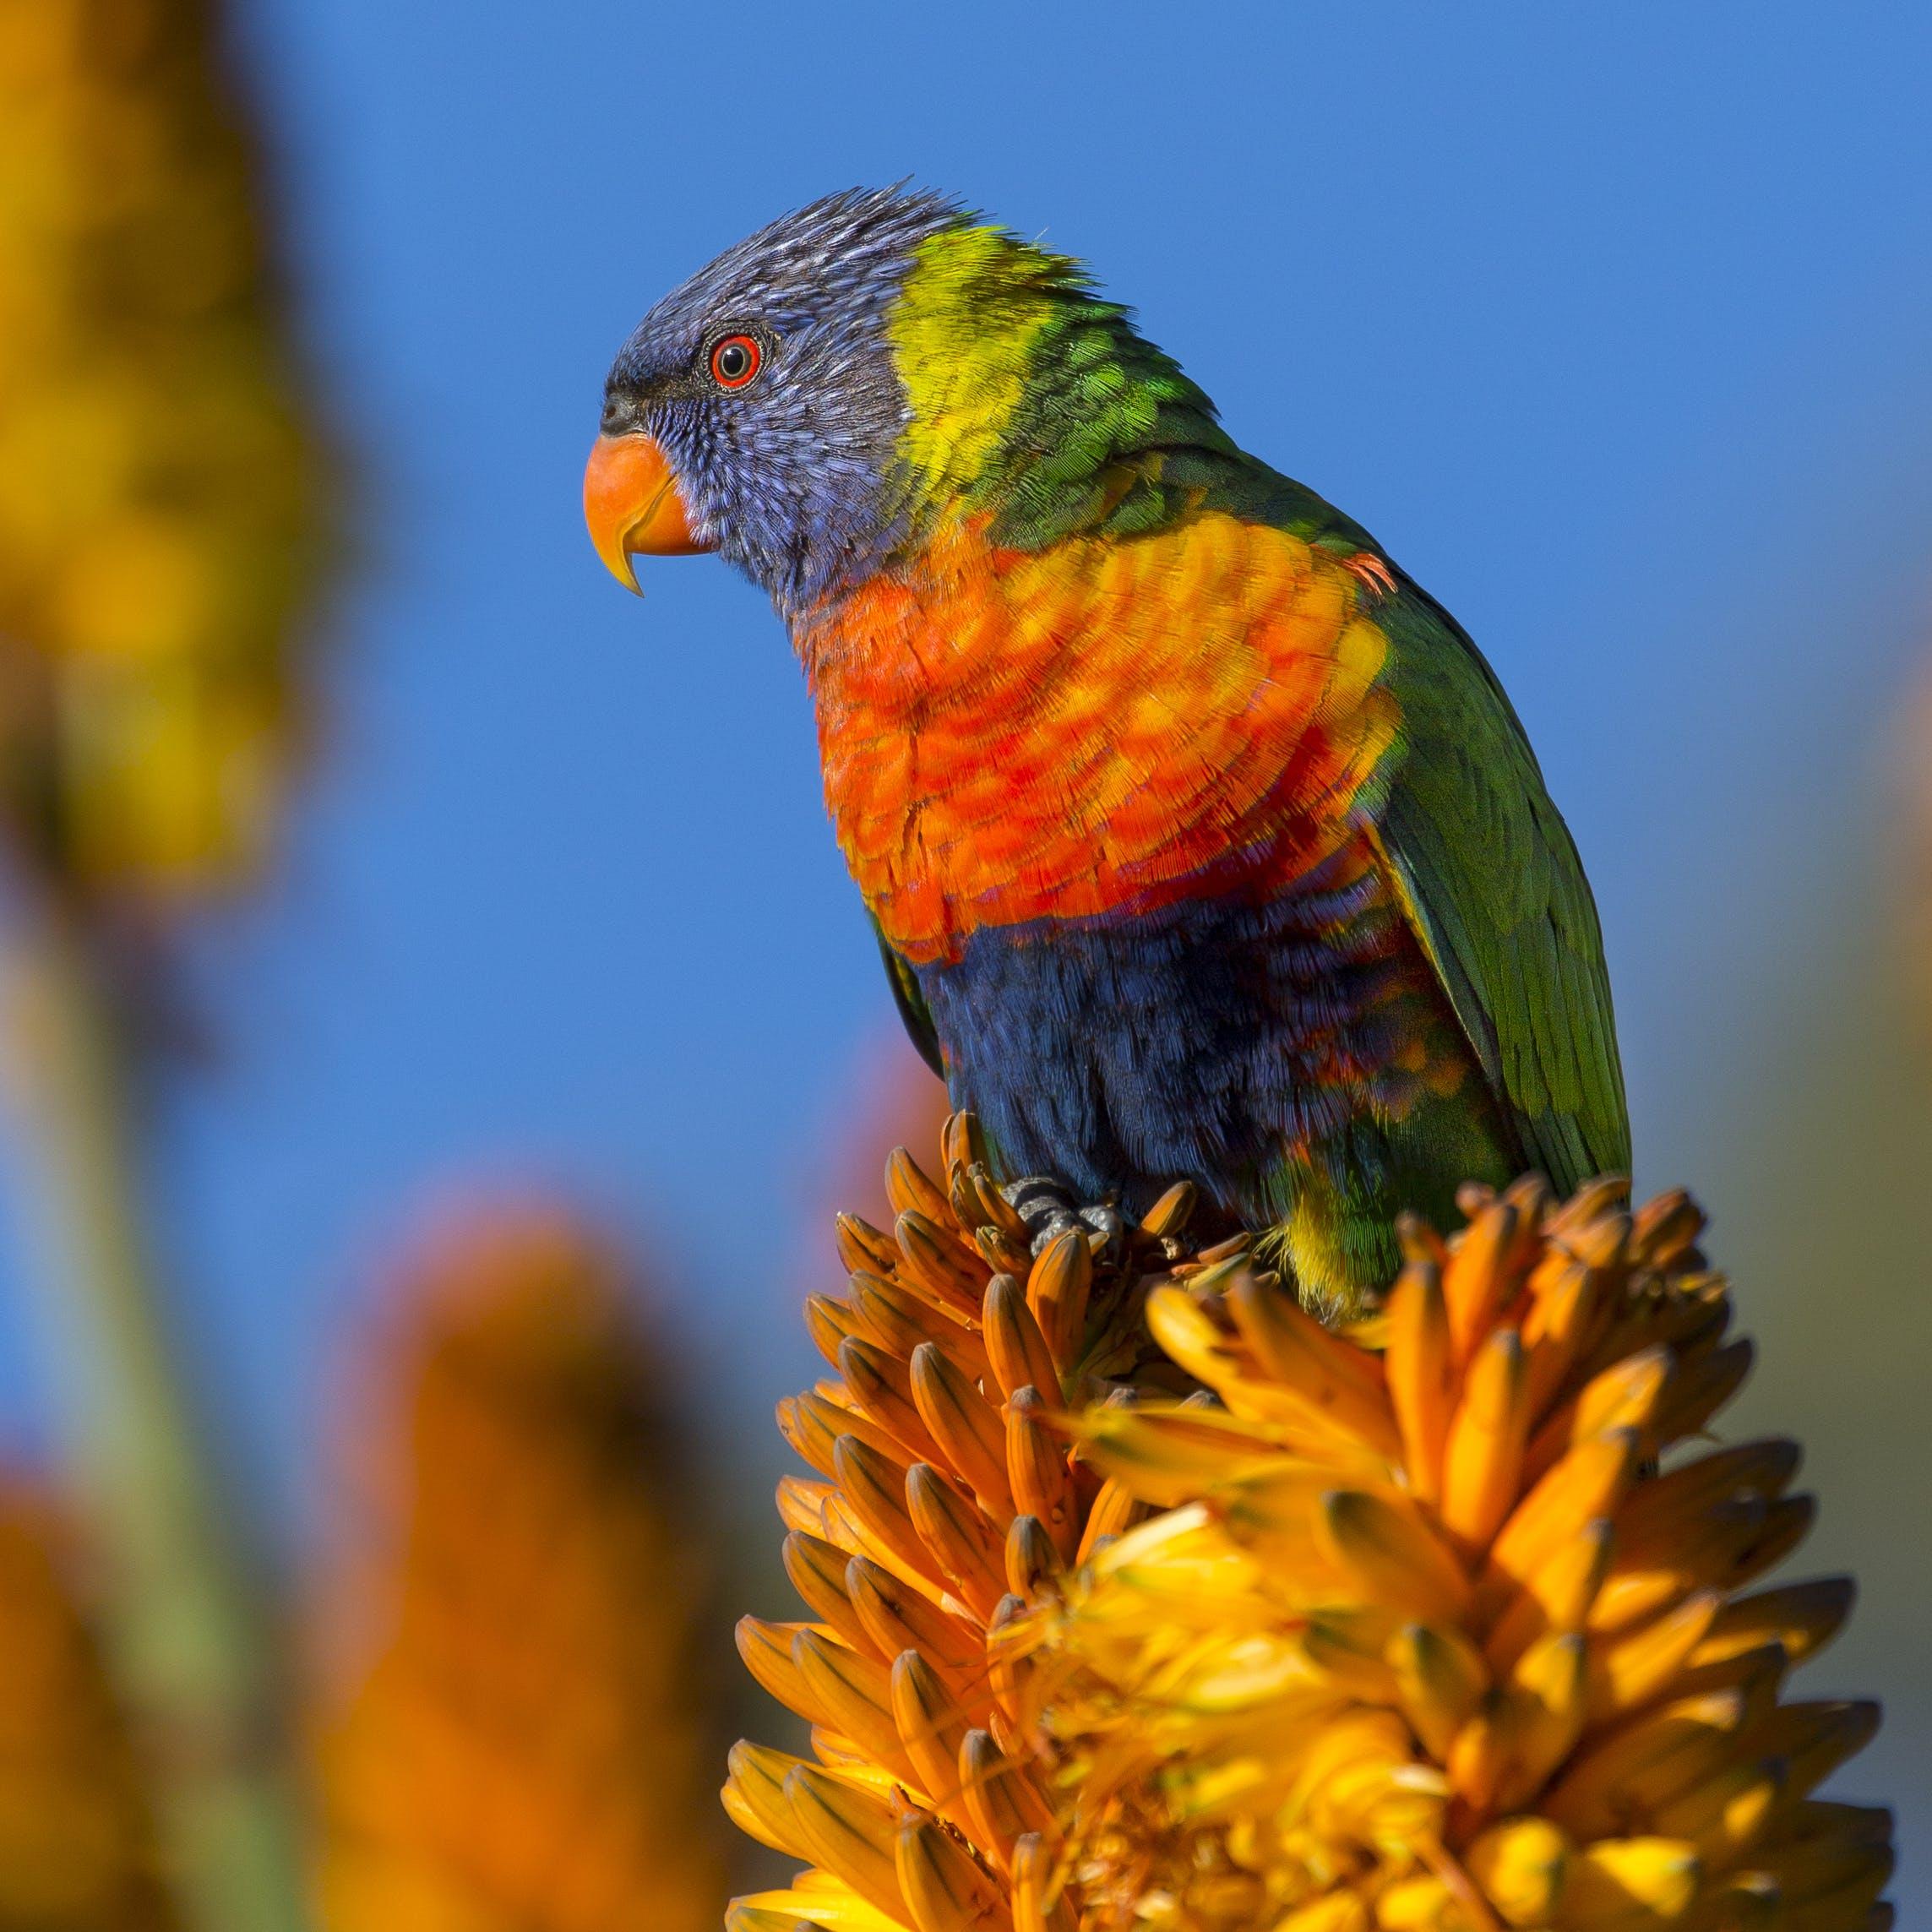 Blue Orange and Green Bird on Yellow Flower